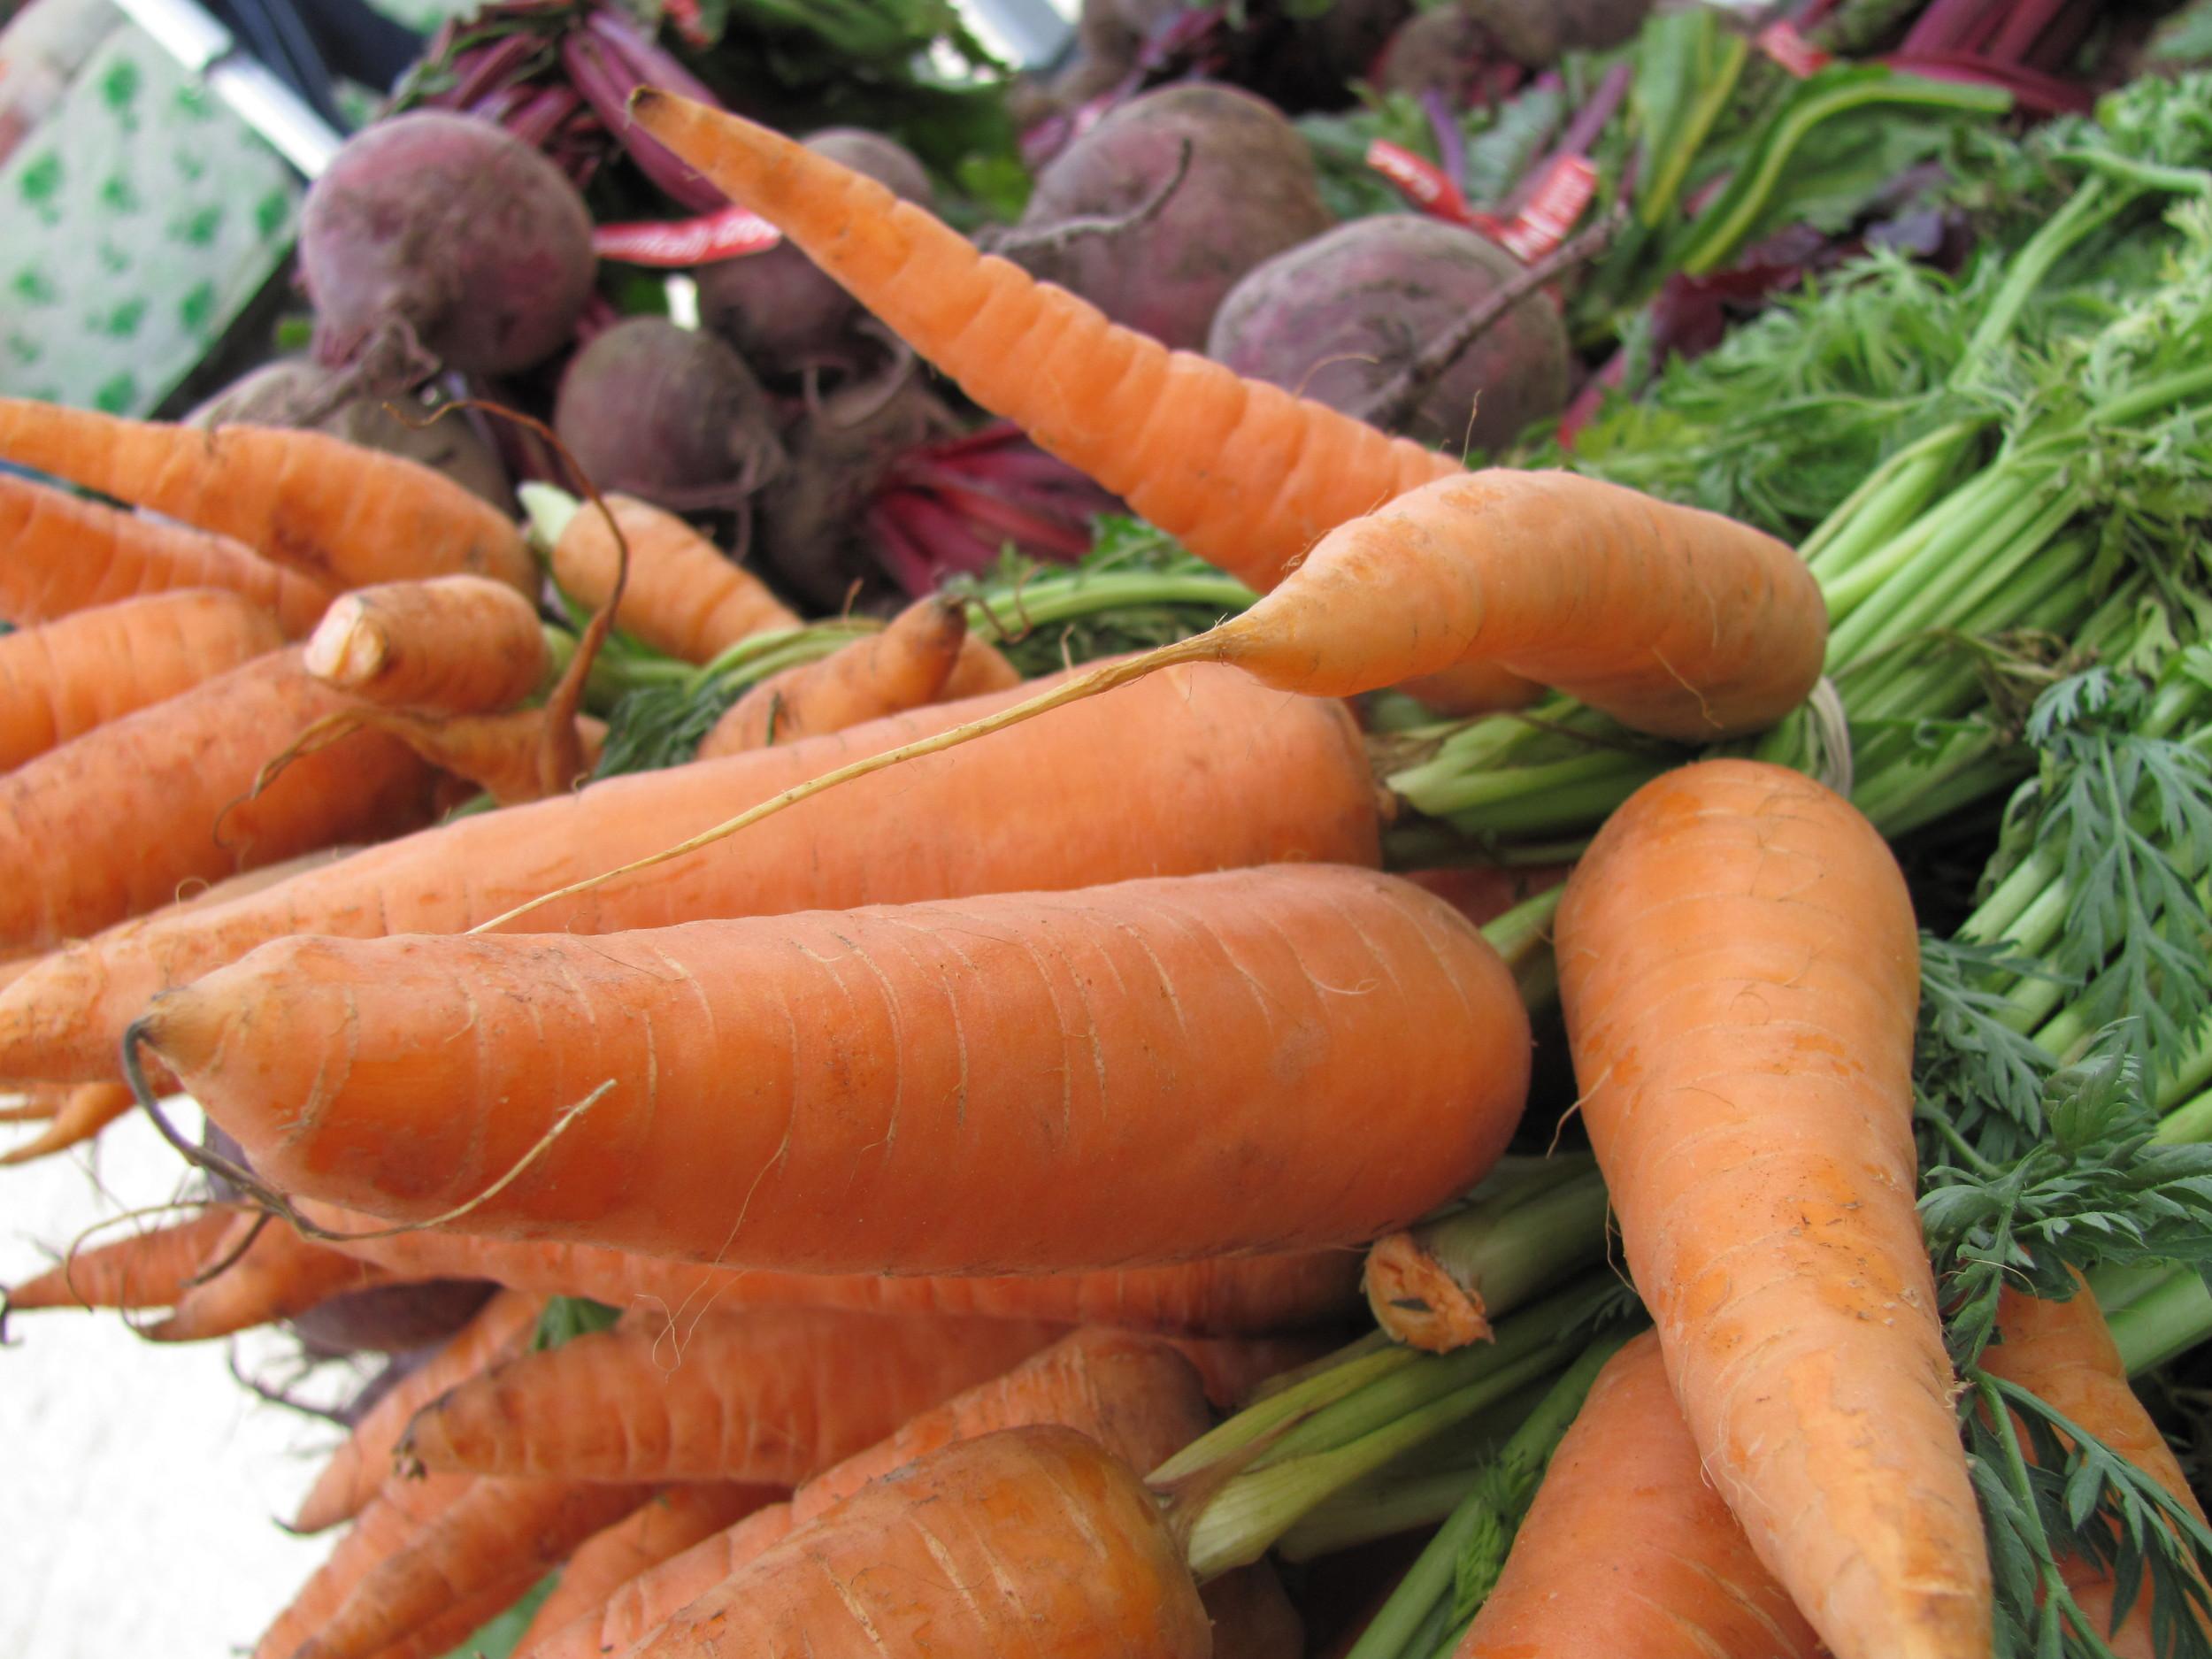 Saratoga Farmers Market carrots